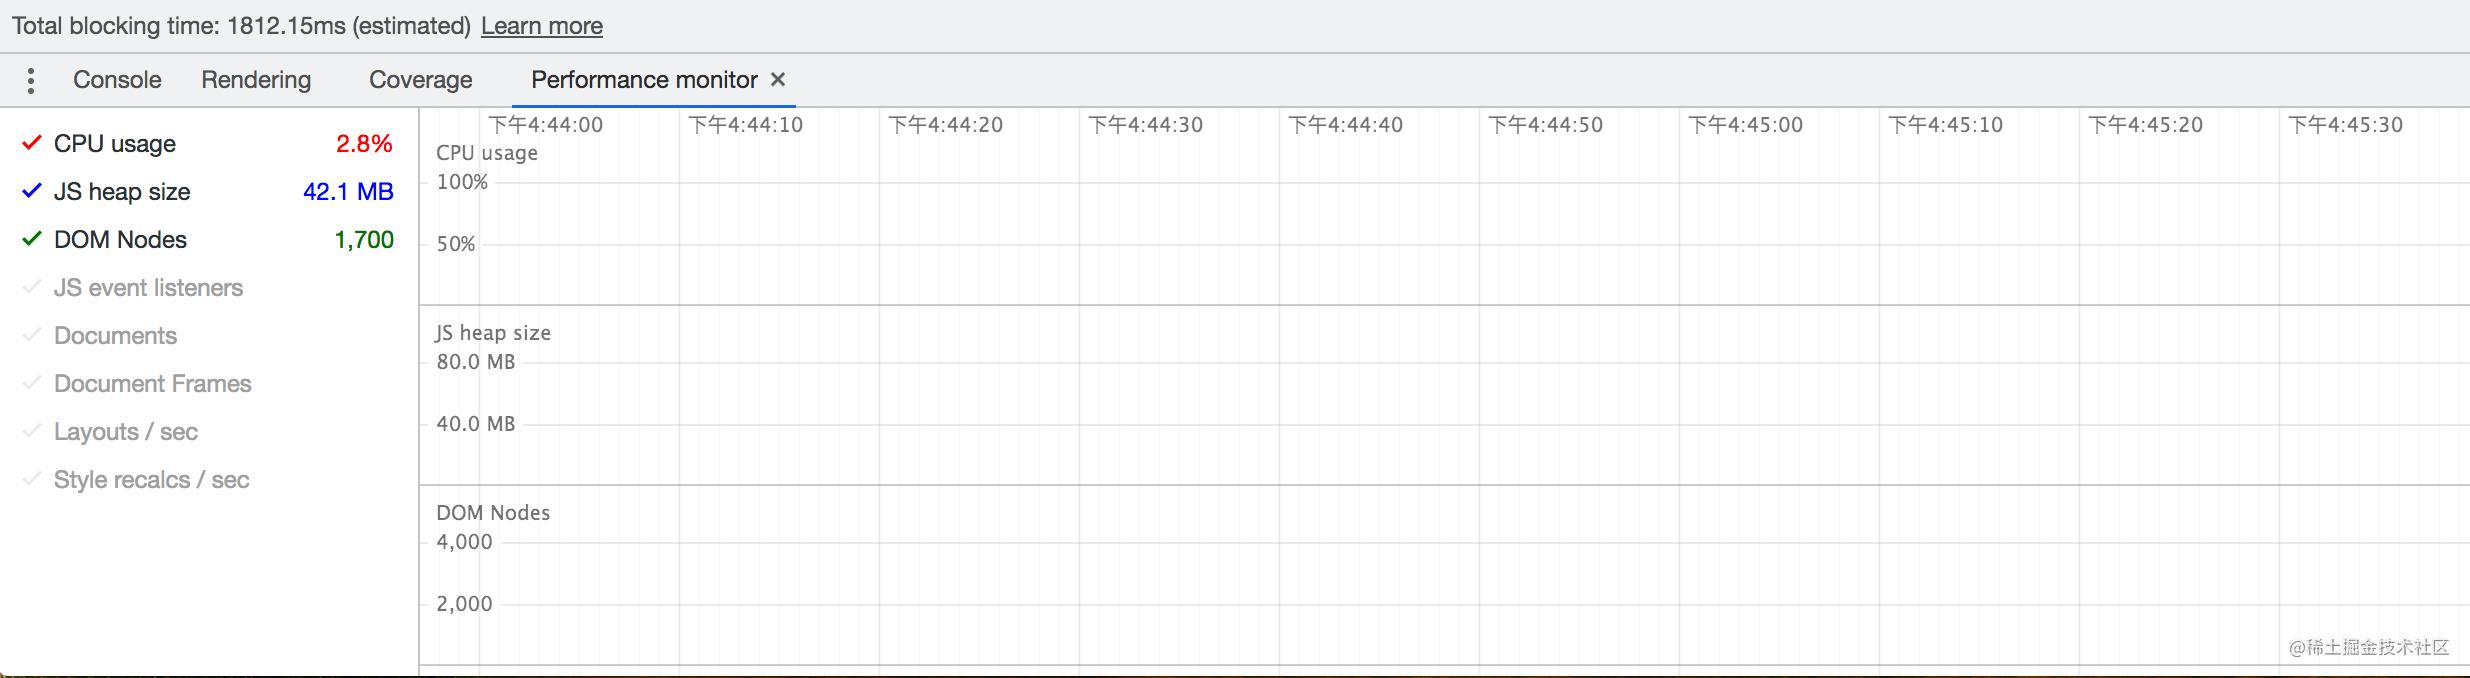 屏幕快照 2021-06-16 16.46.24.png